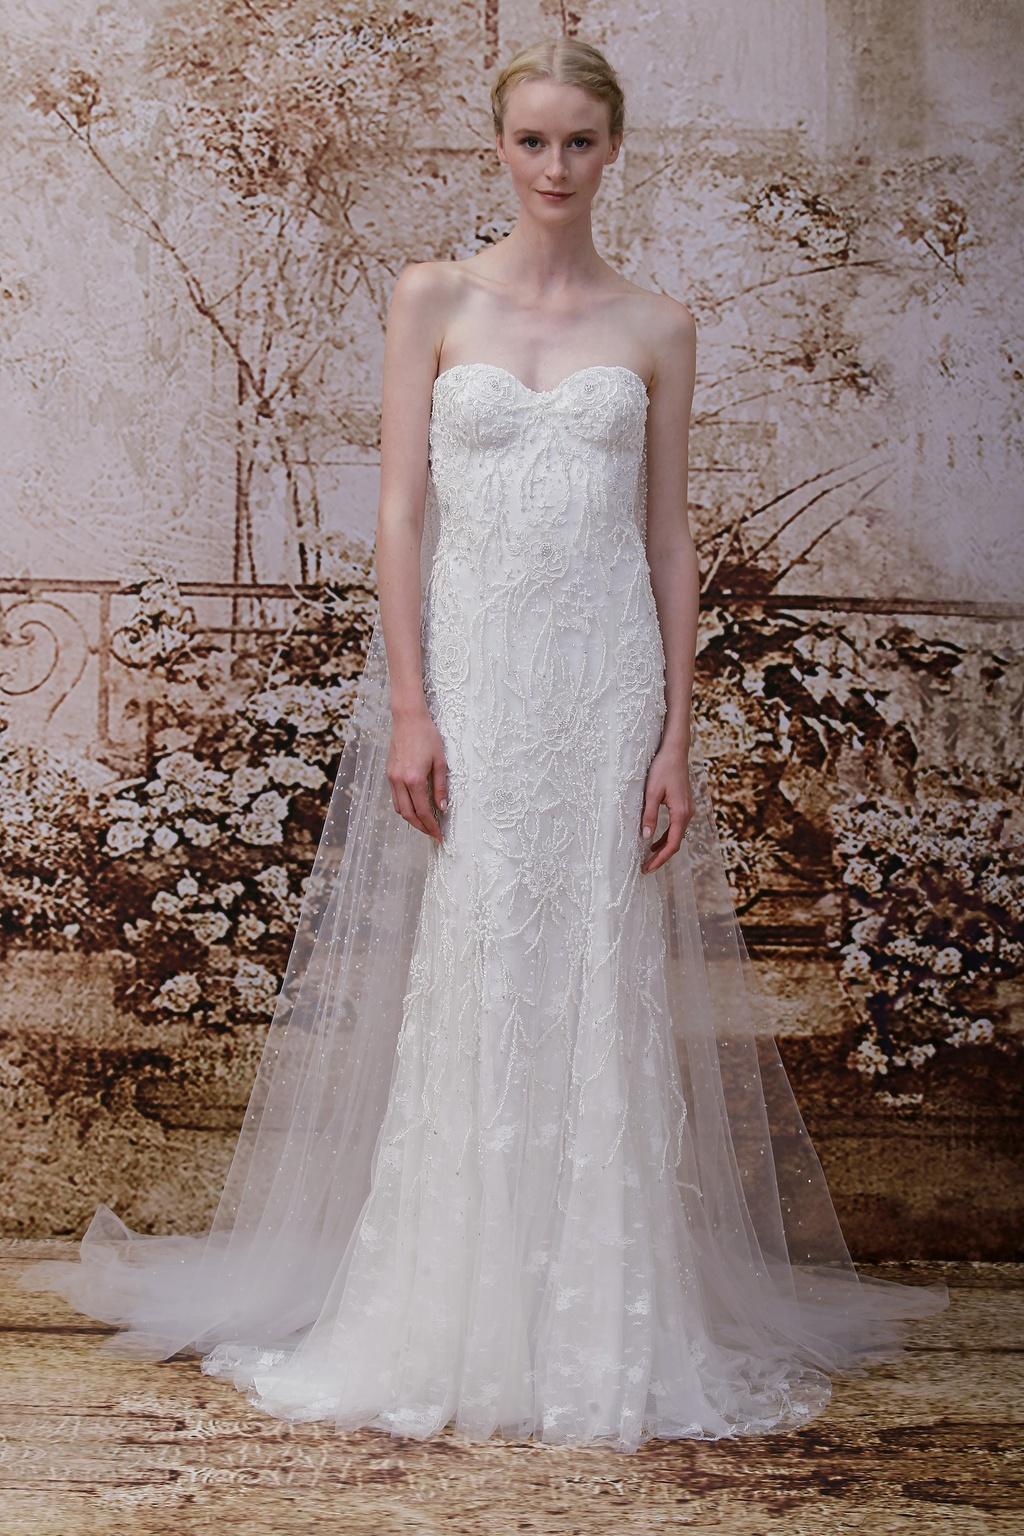 Wedding-dress-by-monique-lhuillier-fall-2014-bridal-look-19.full